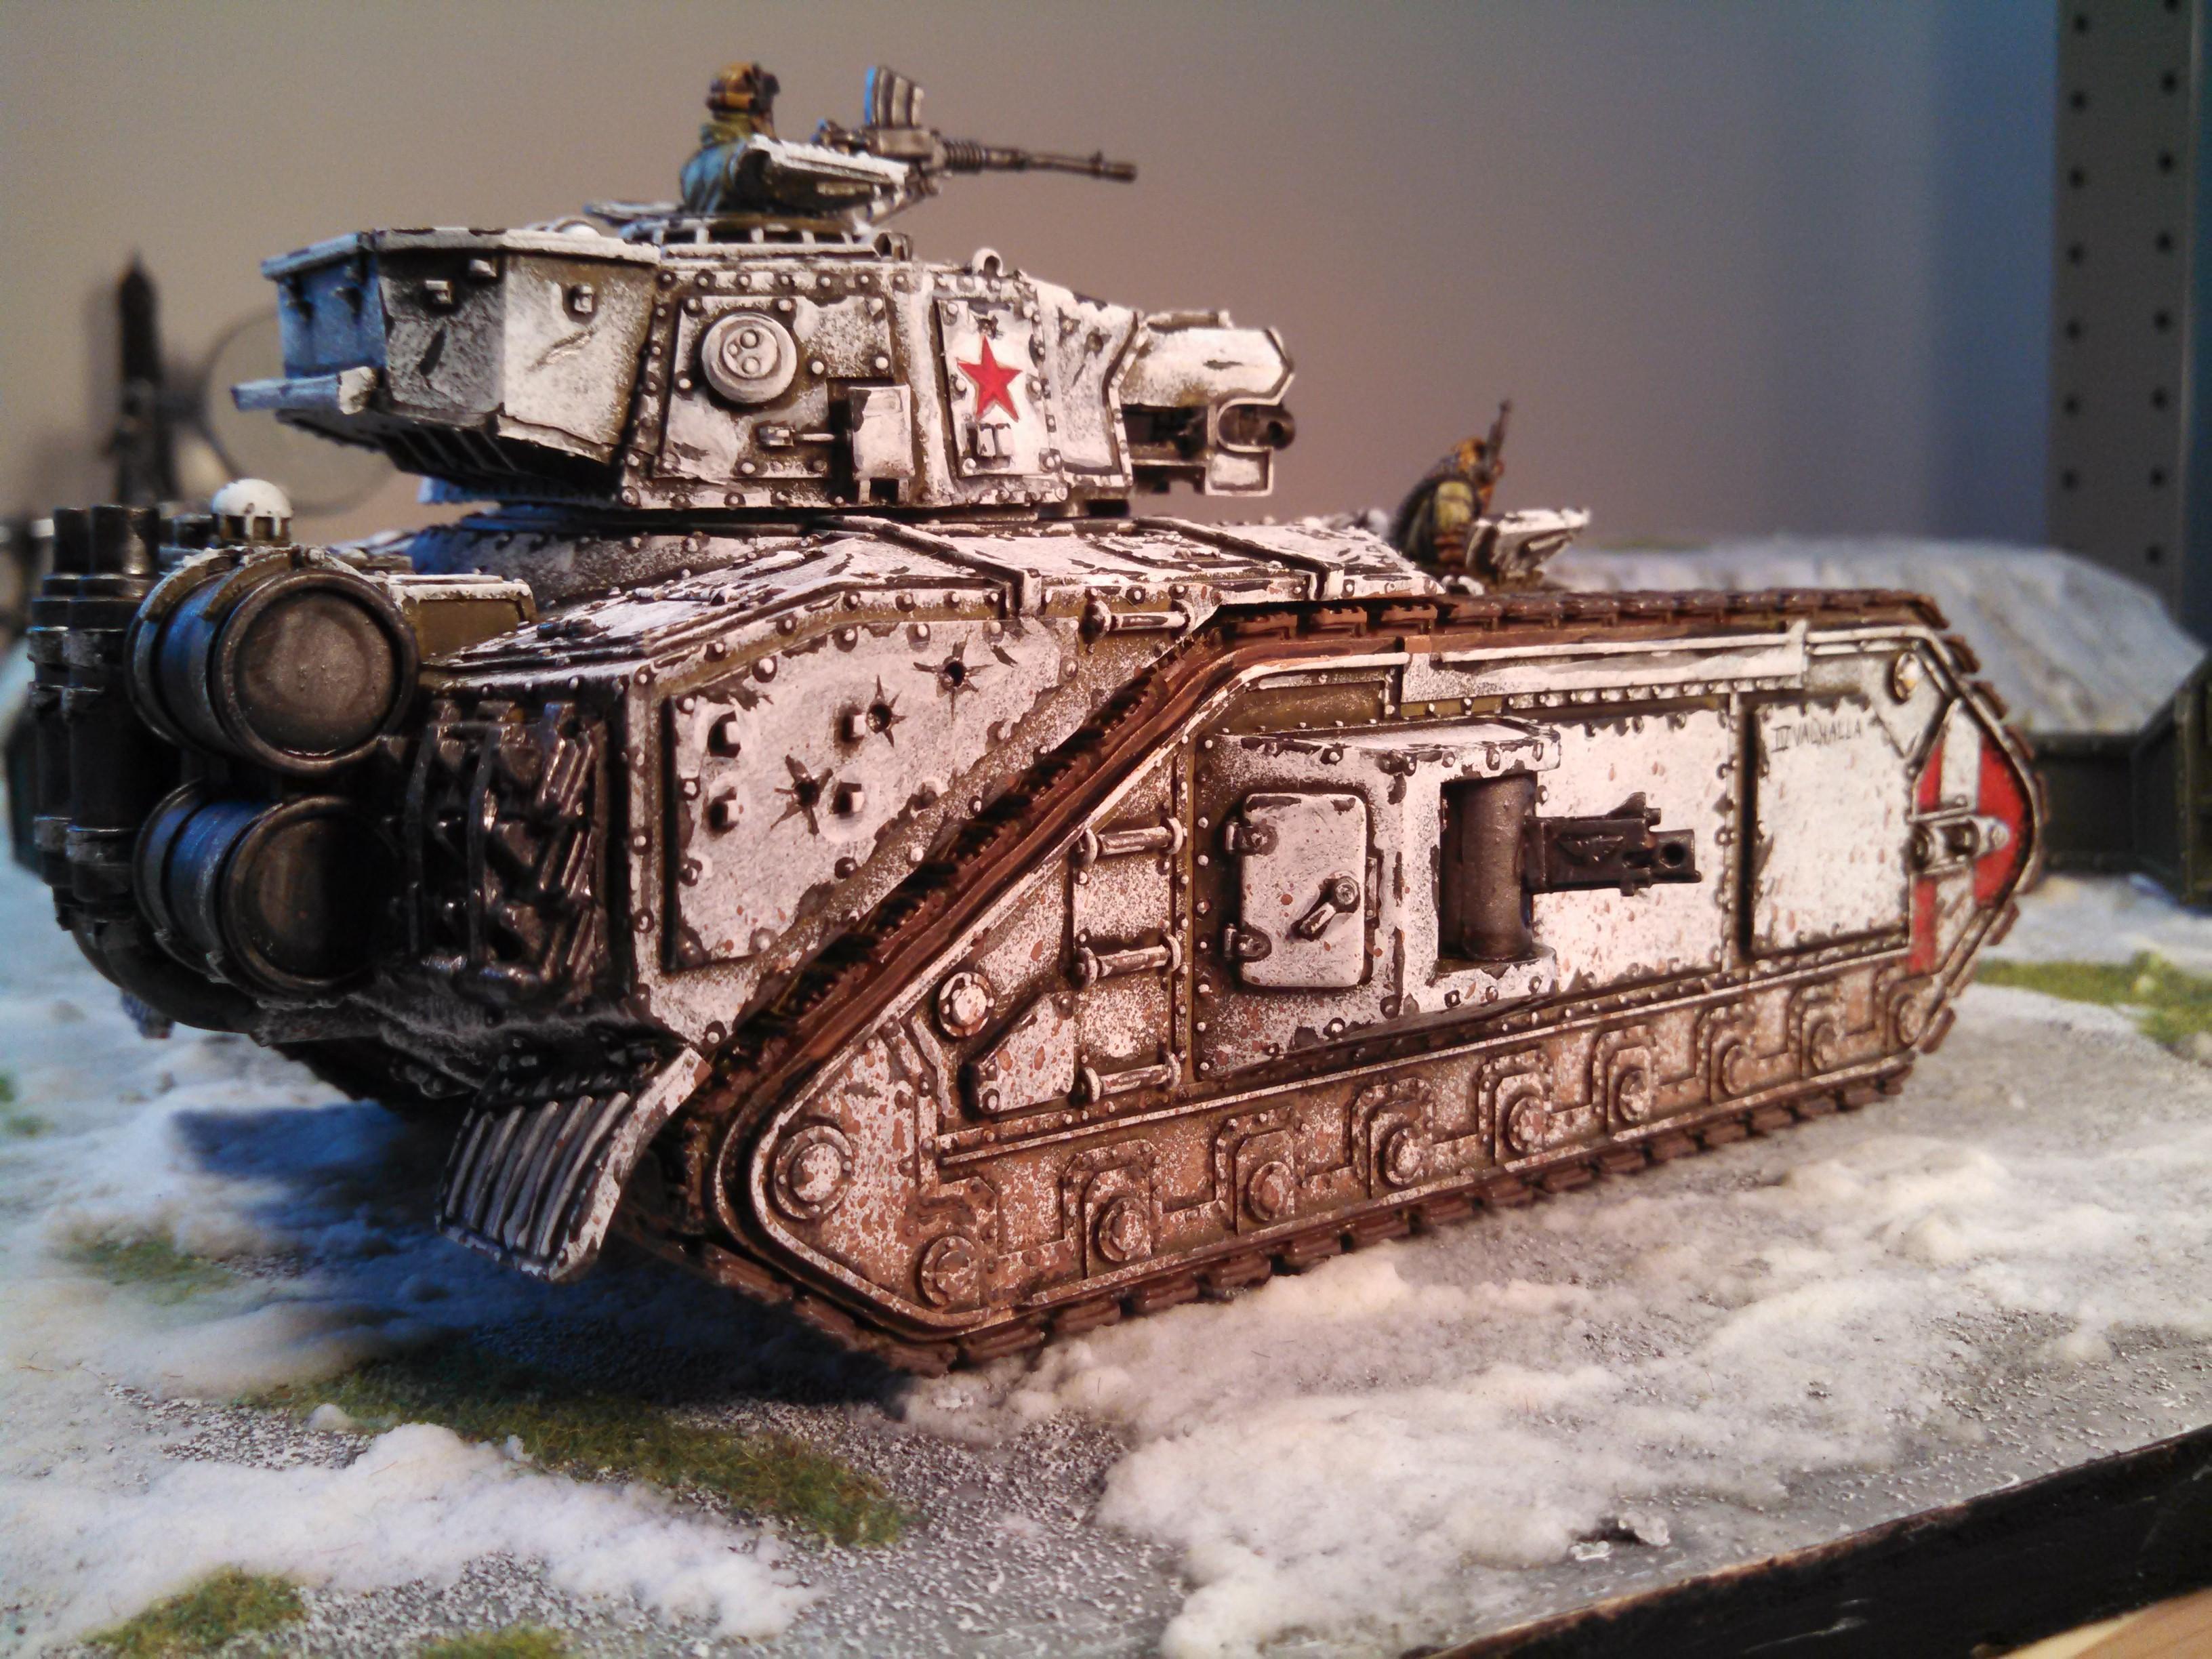 Astra Militarum, Imperial Guard, Macharius, Macharius Vulcan, Super-heavy, Tank